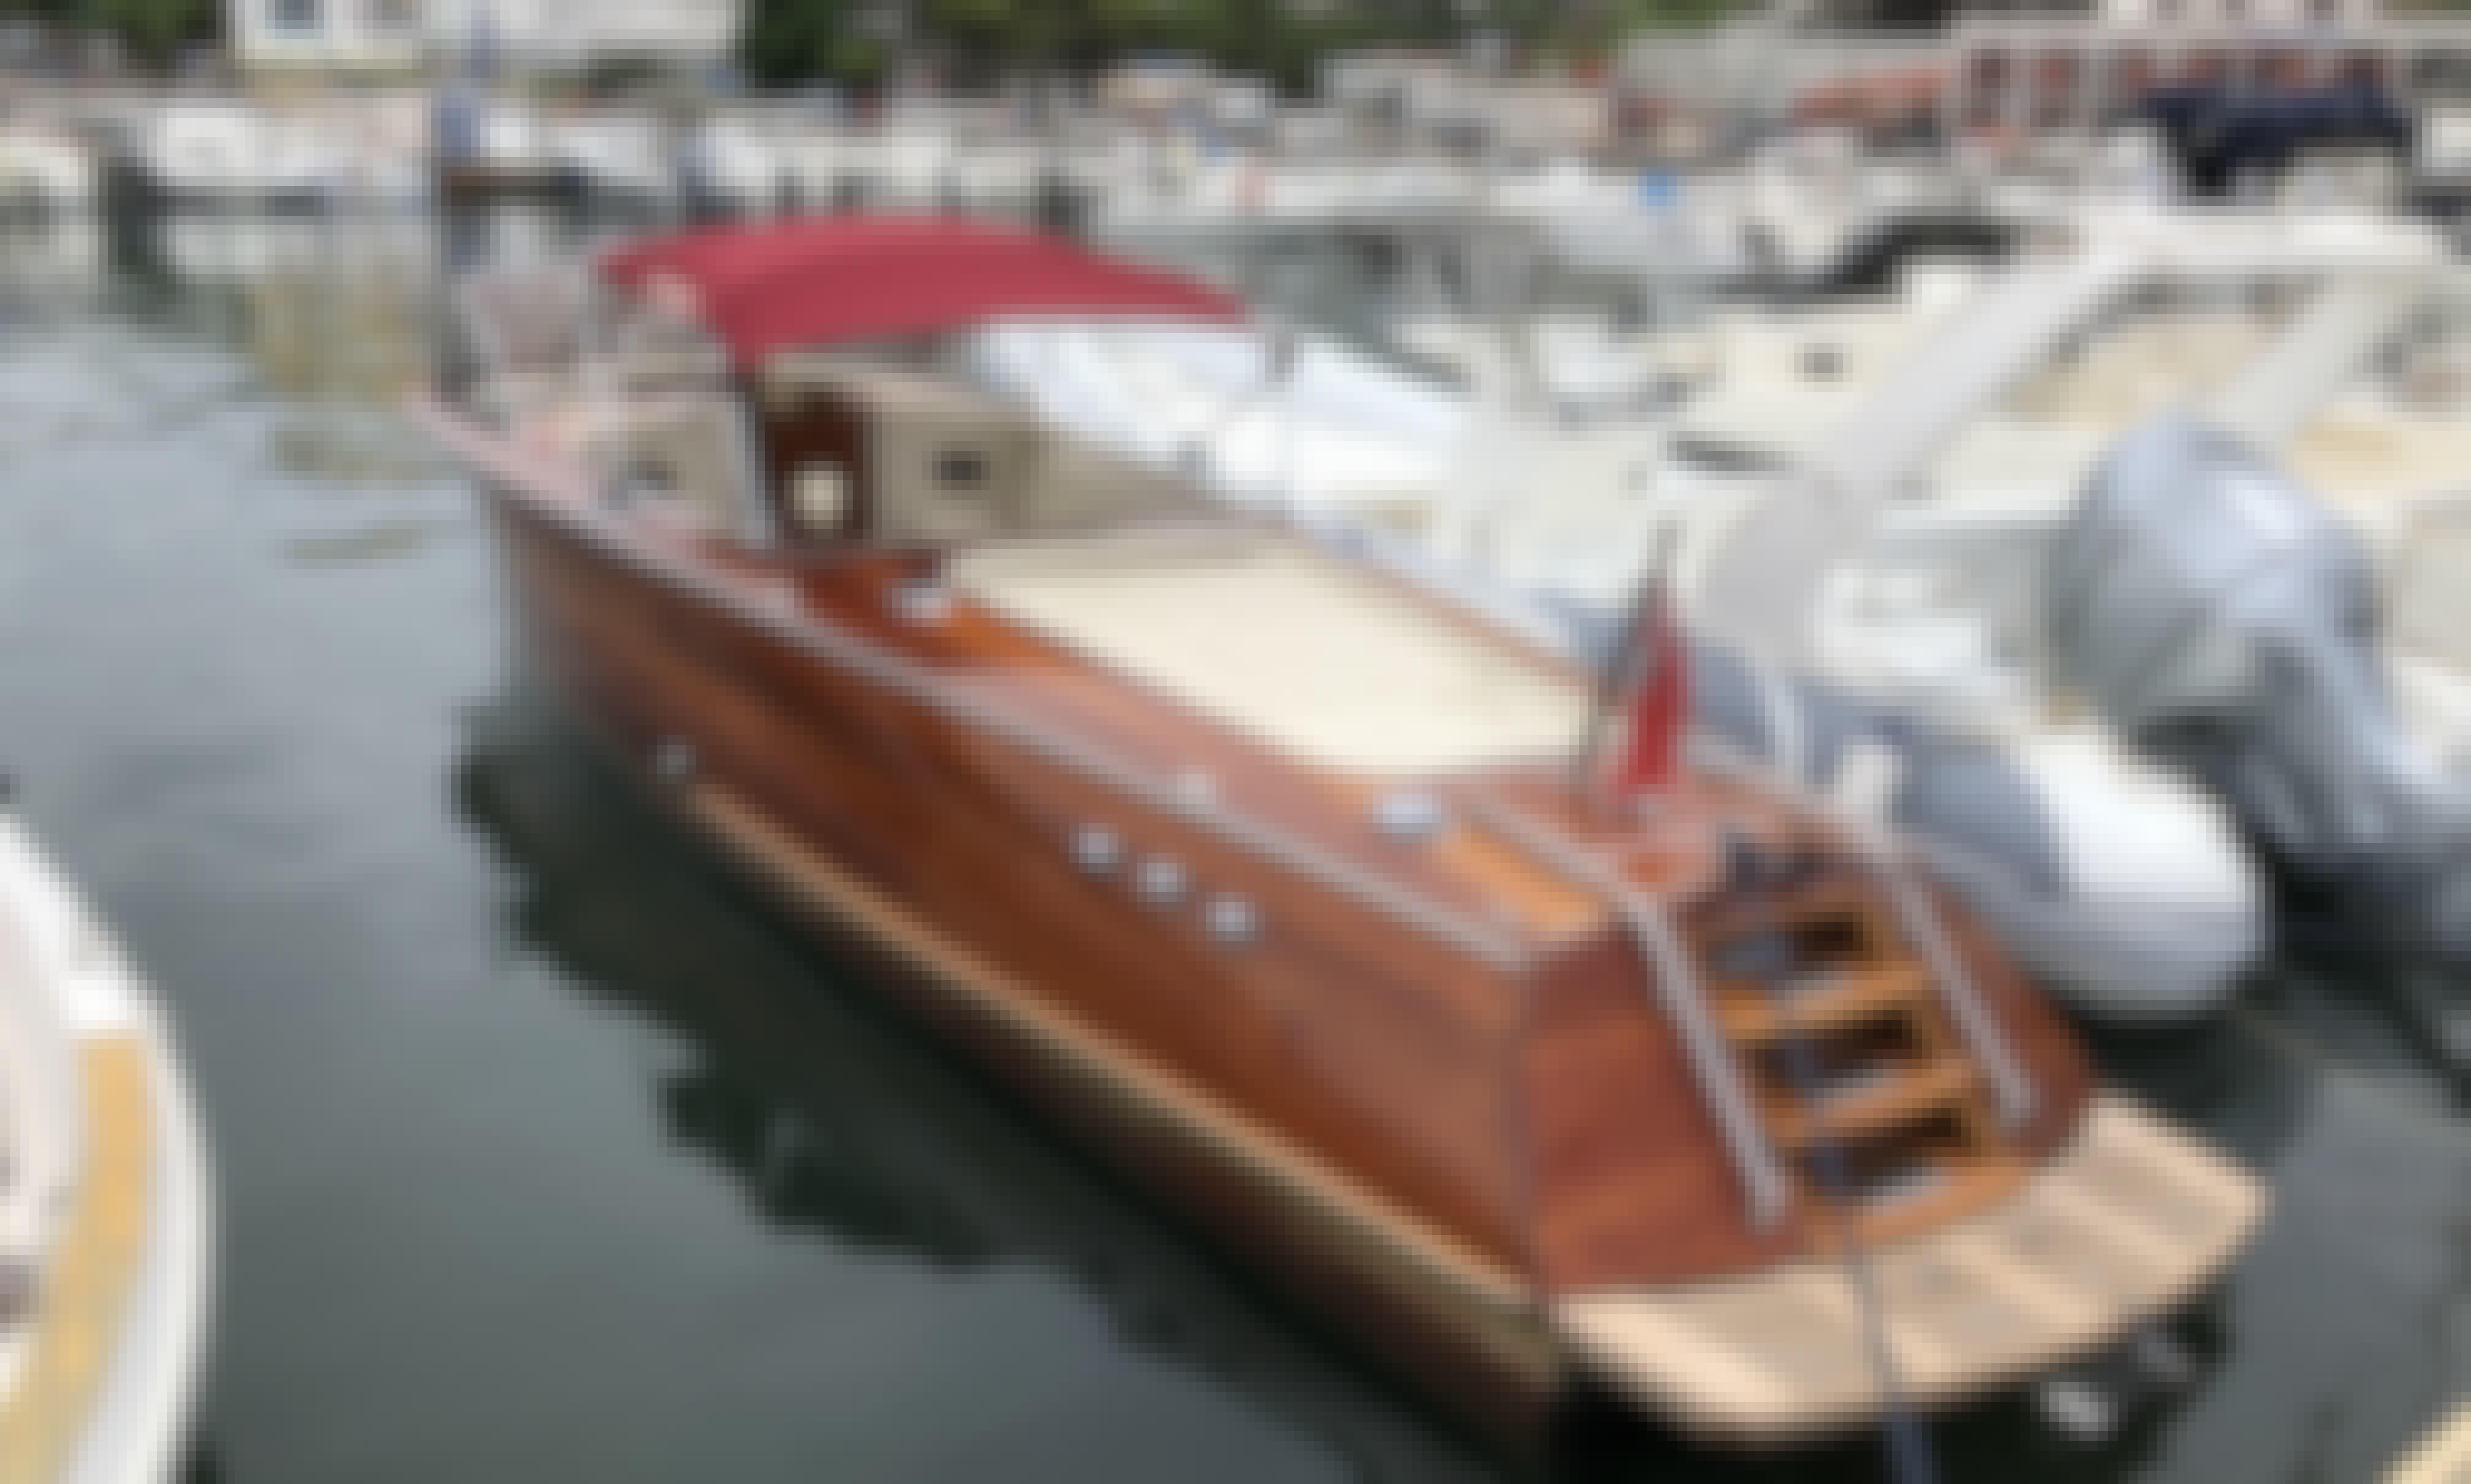 Iconic Riva Acquarama Vintage Motor Boat in Agropoli, Campania